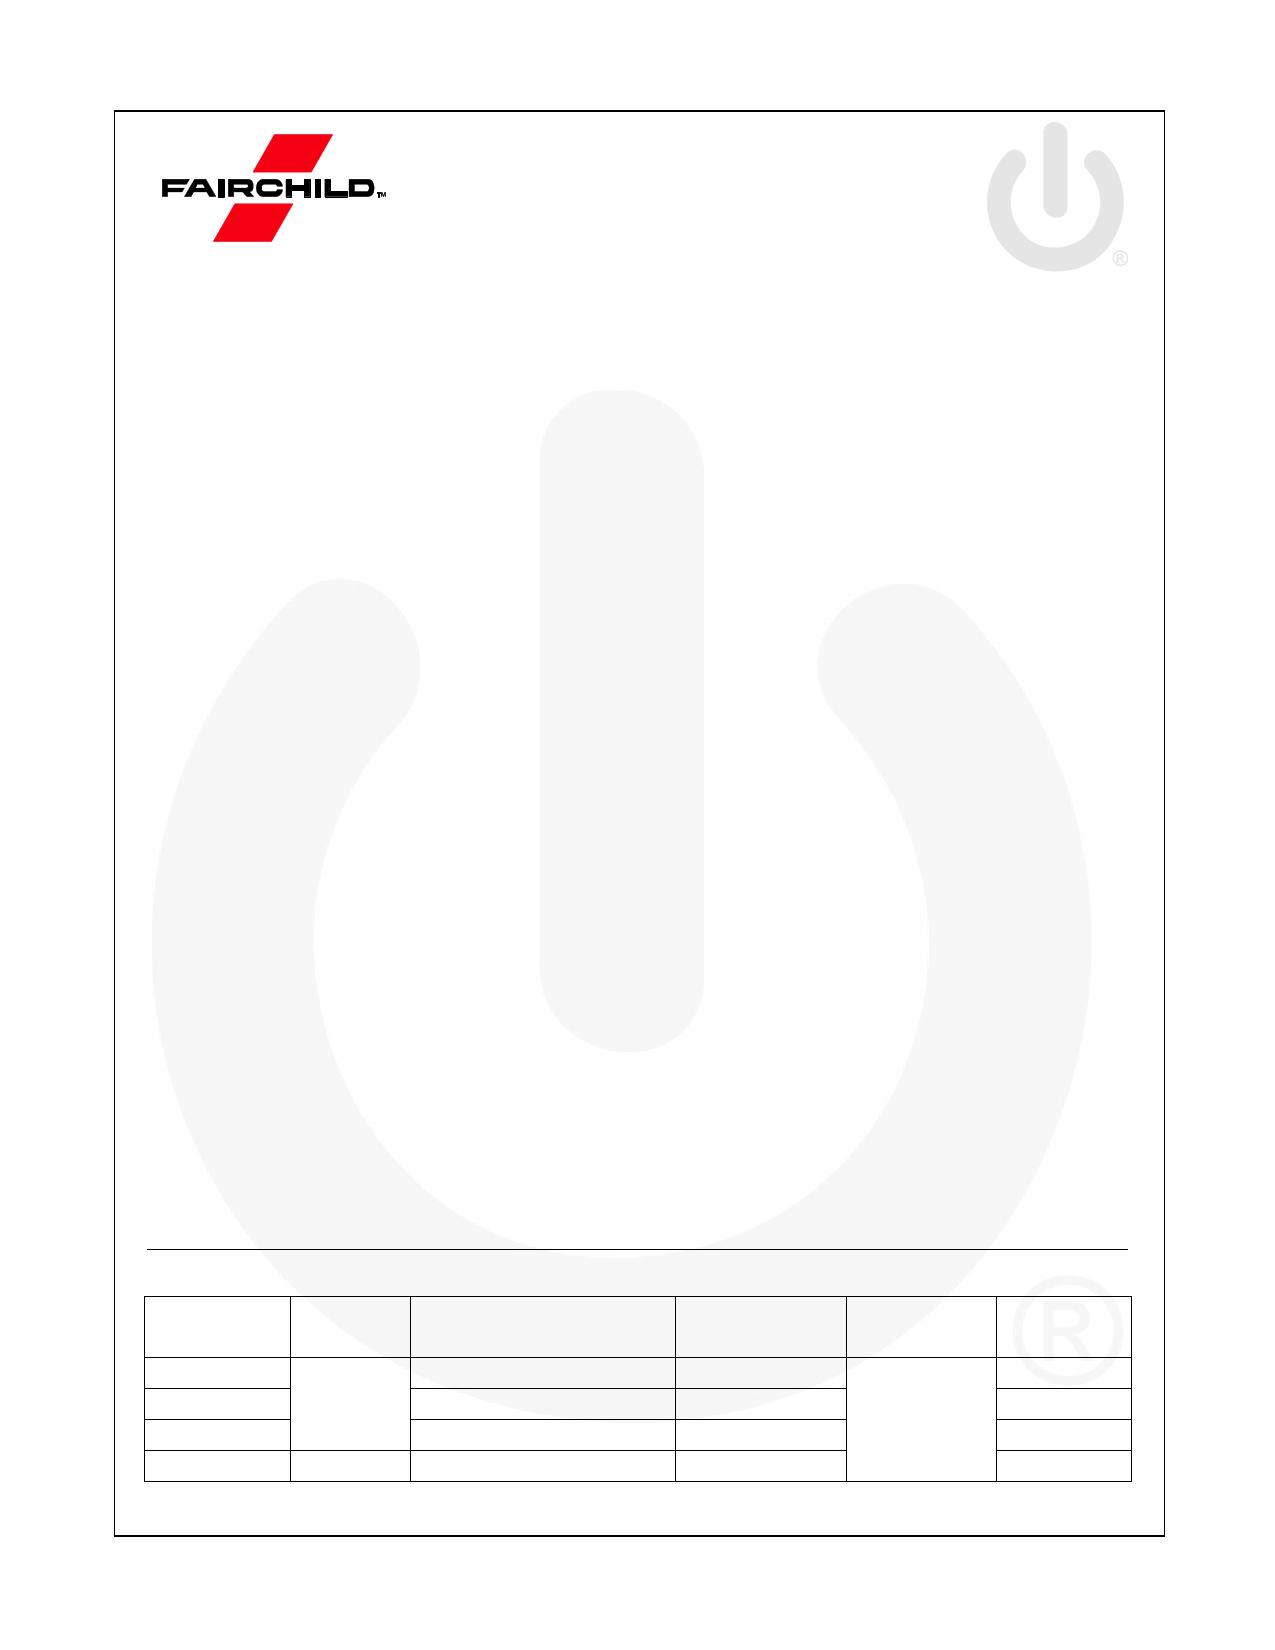 FPF2195 Datasheet